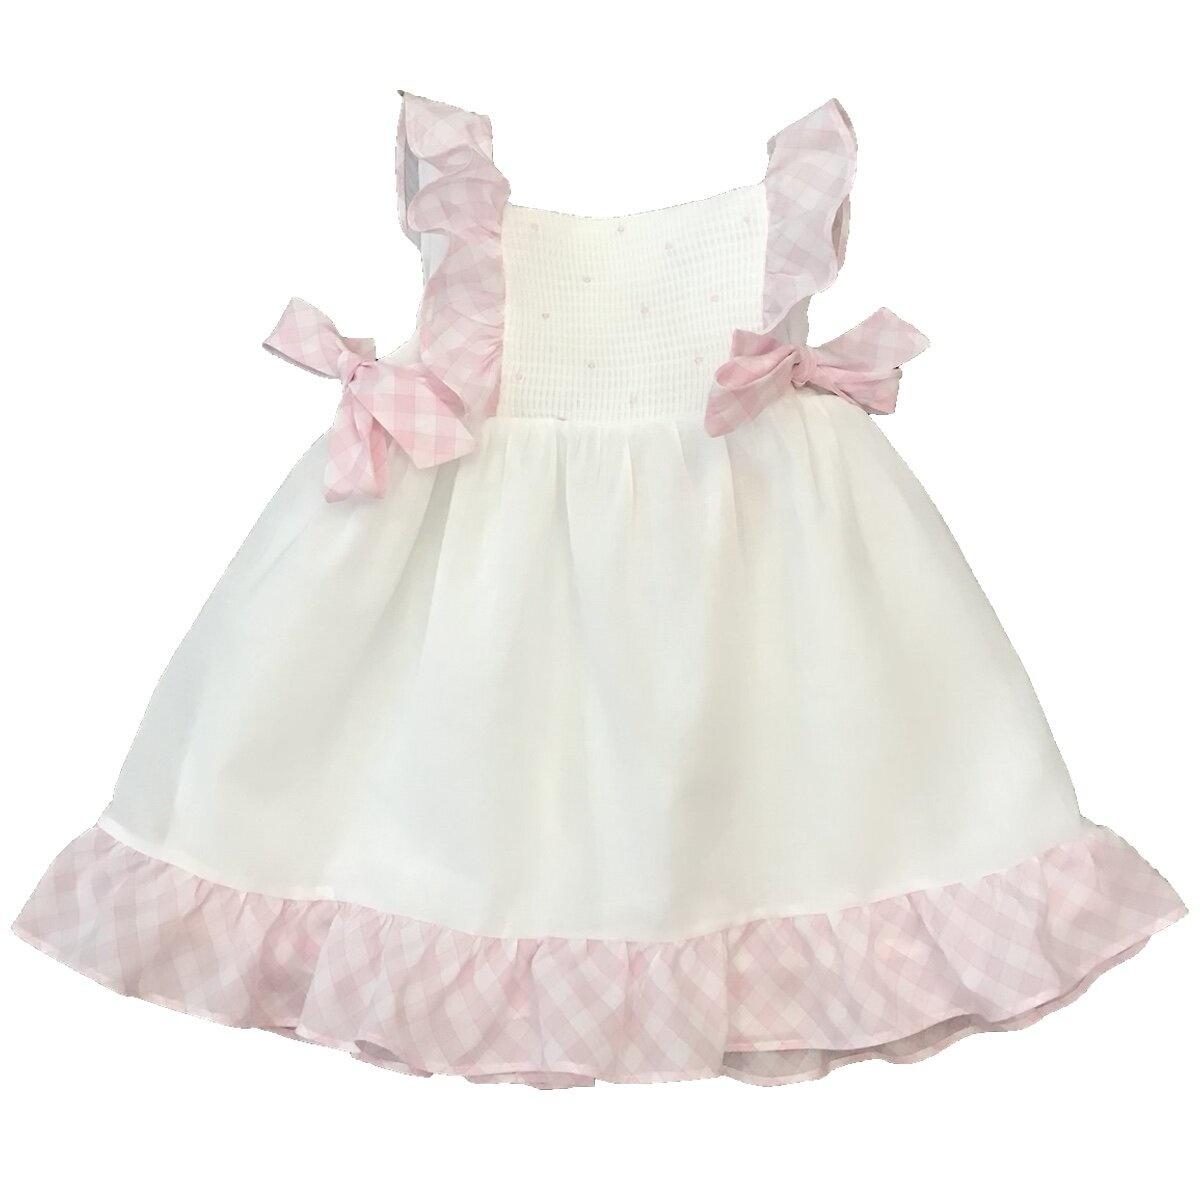 Patachou Patachou White & Pink Smocked Dress 3076 S21